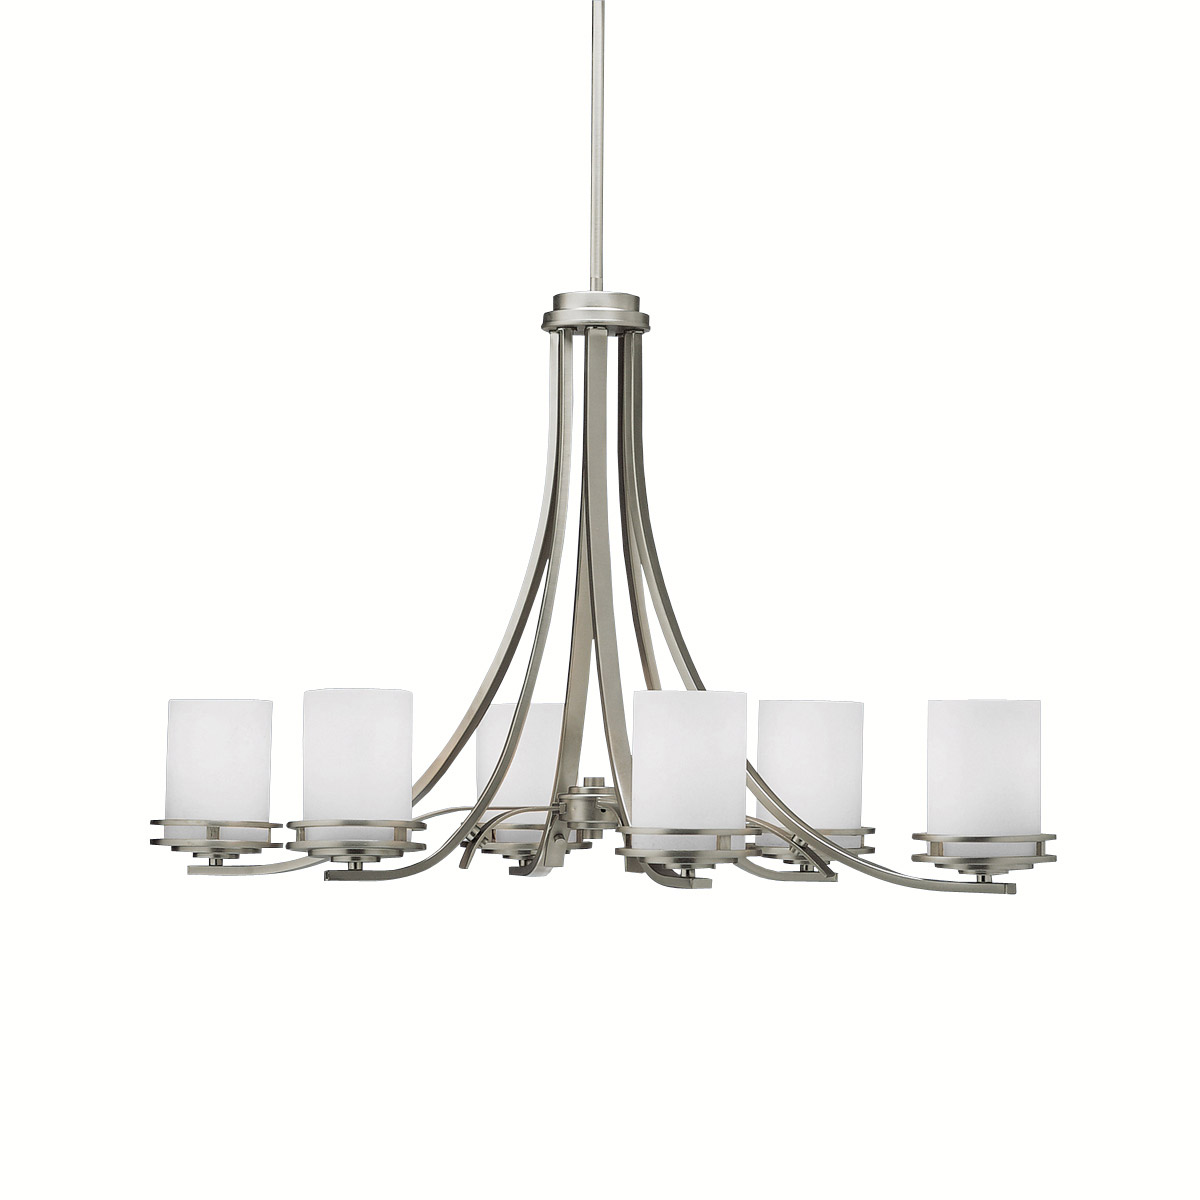 Lighting Warehouse Hendrik Potgieter: Kichler Lighting 1673NI Hendrik Chandelier Brushed Nickel